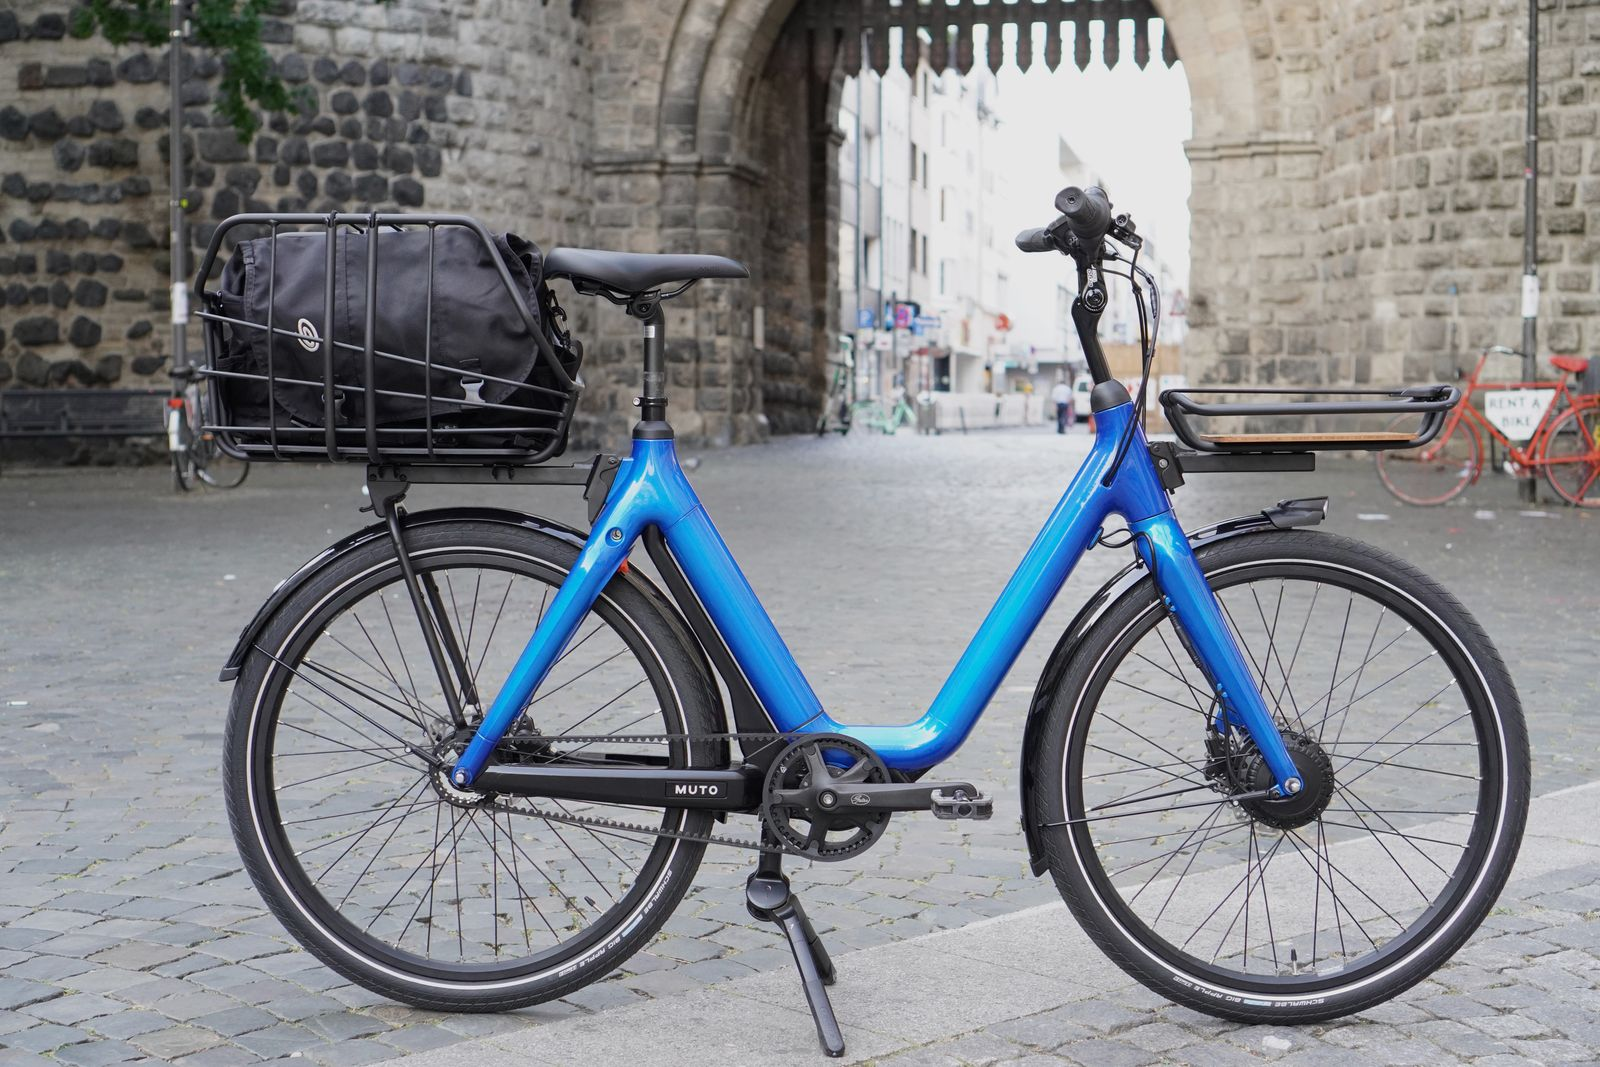 Muto City-E-Bike